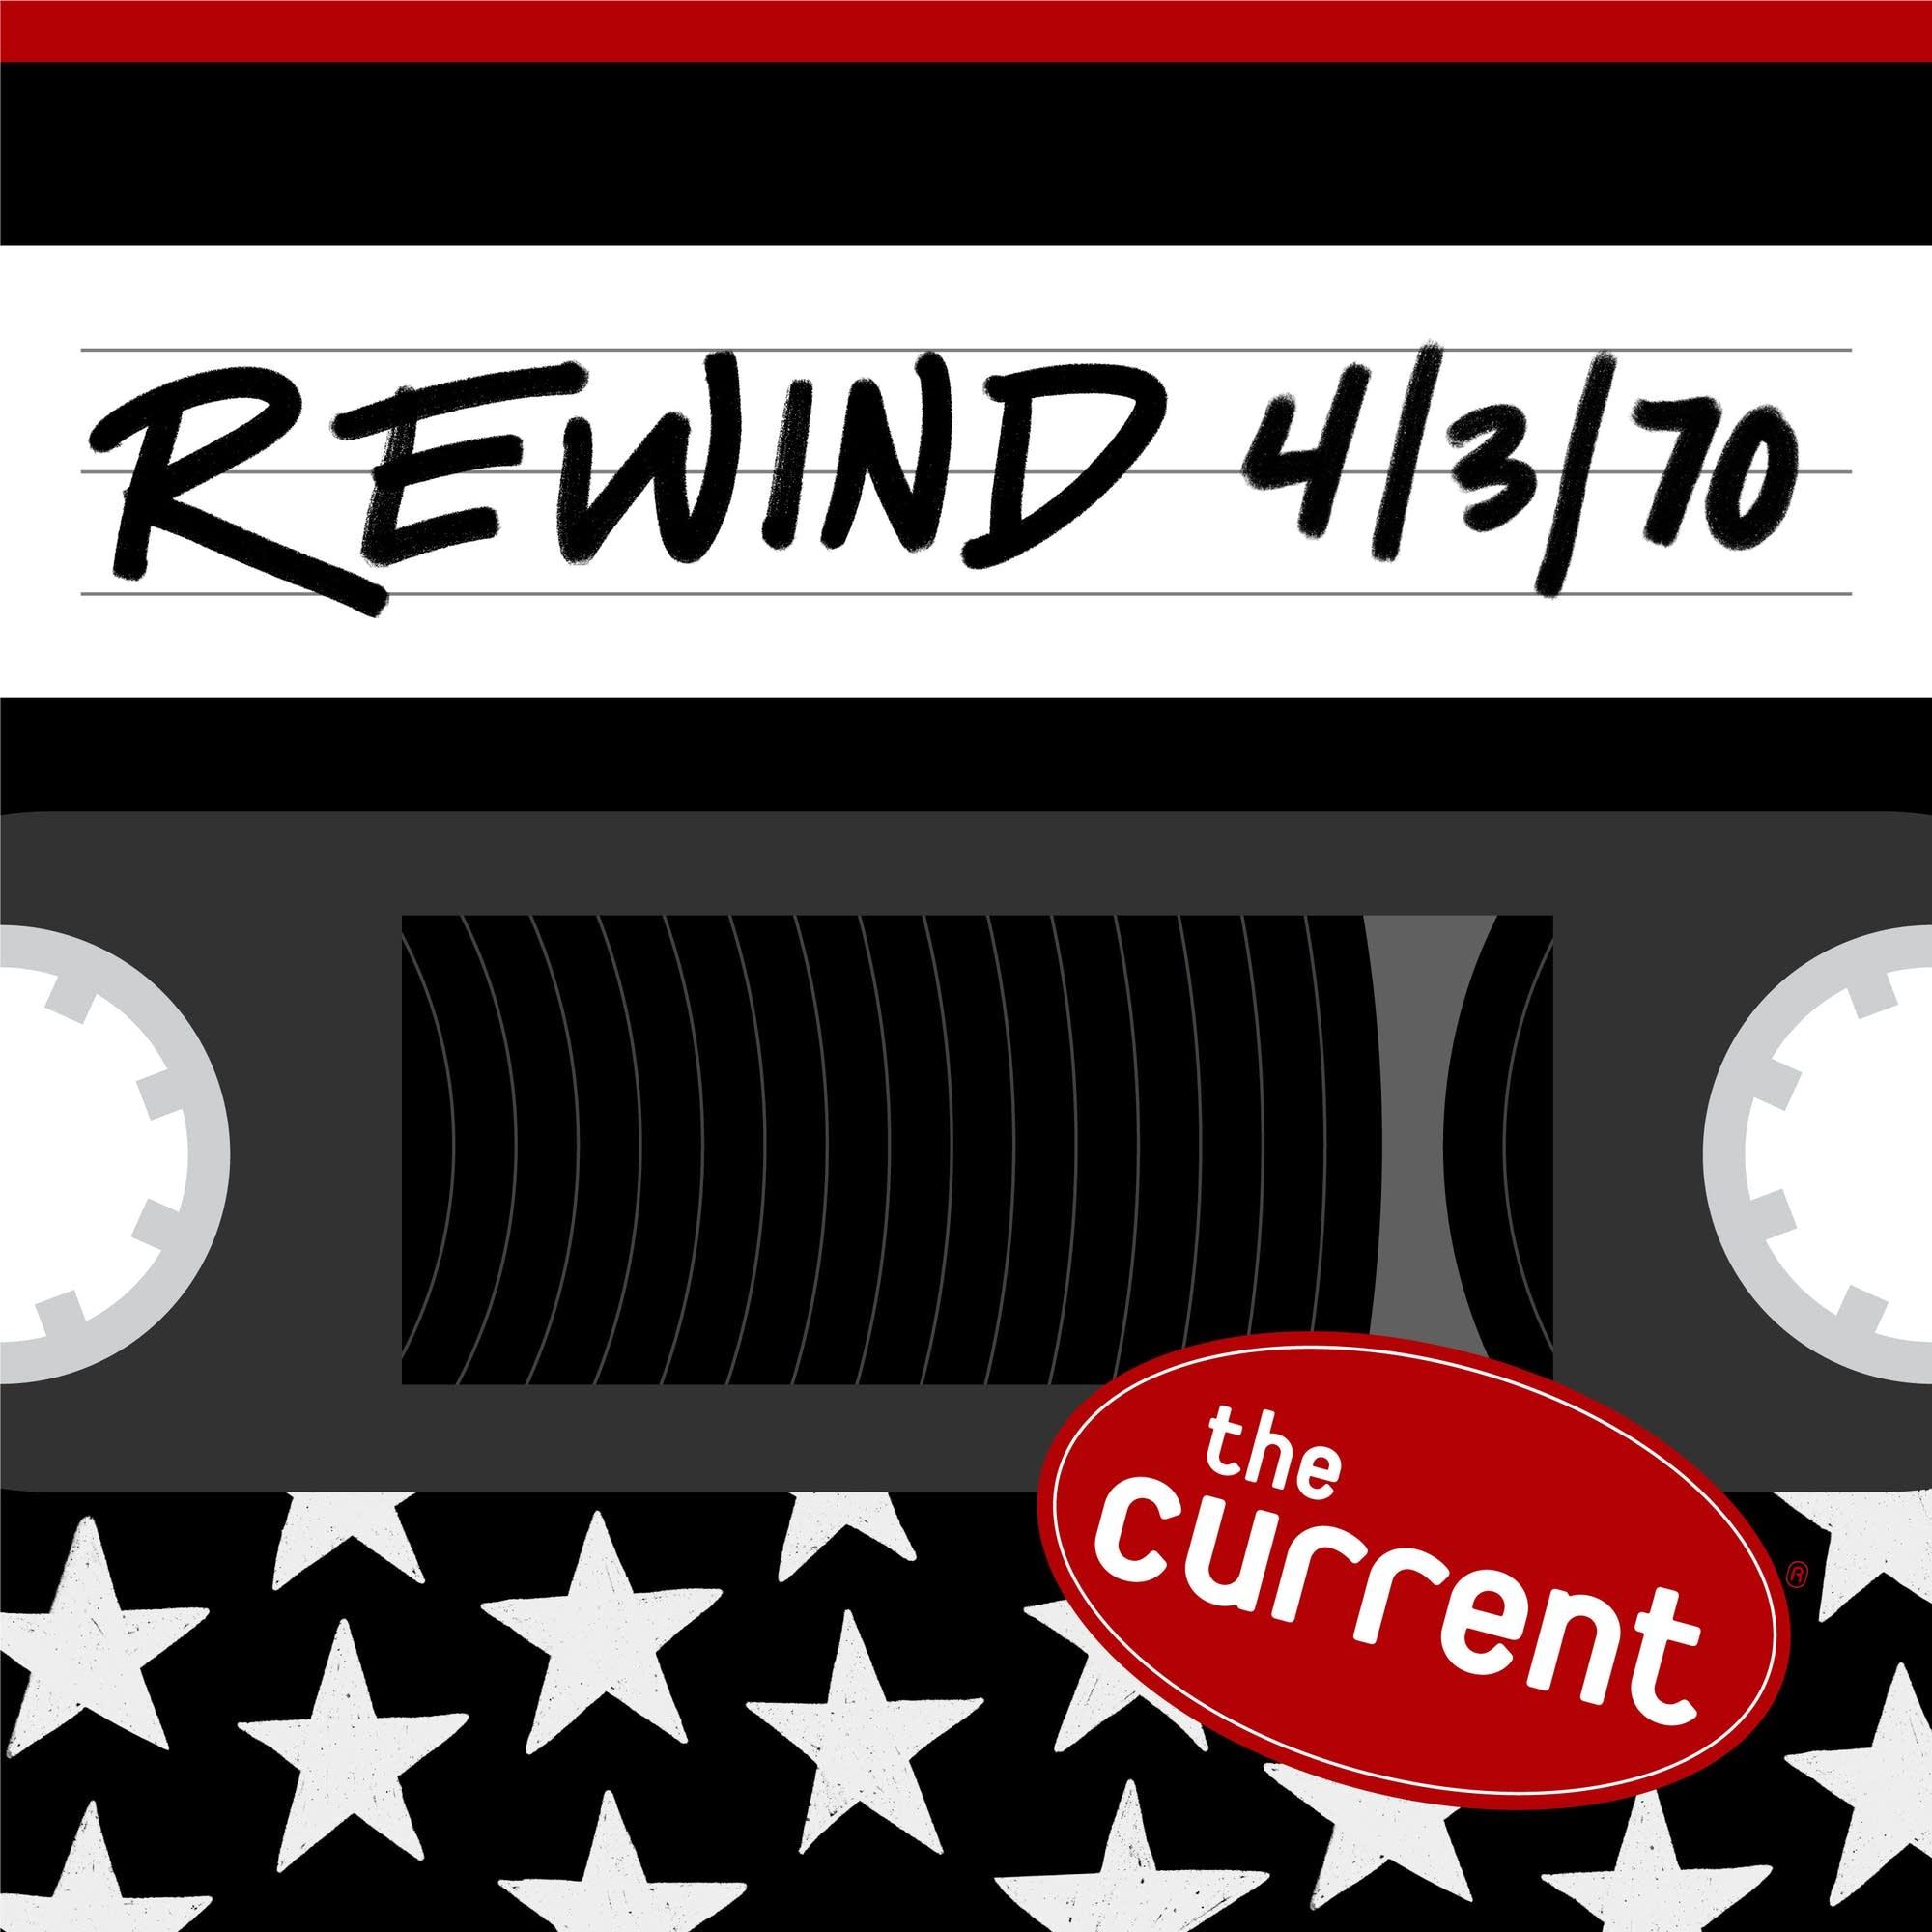 The Current Rewind: 4/3/70